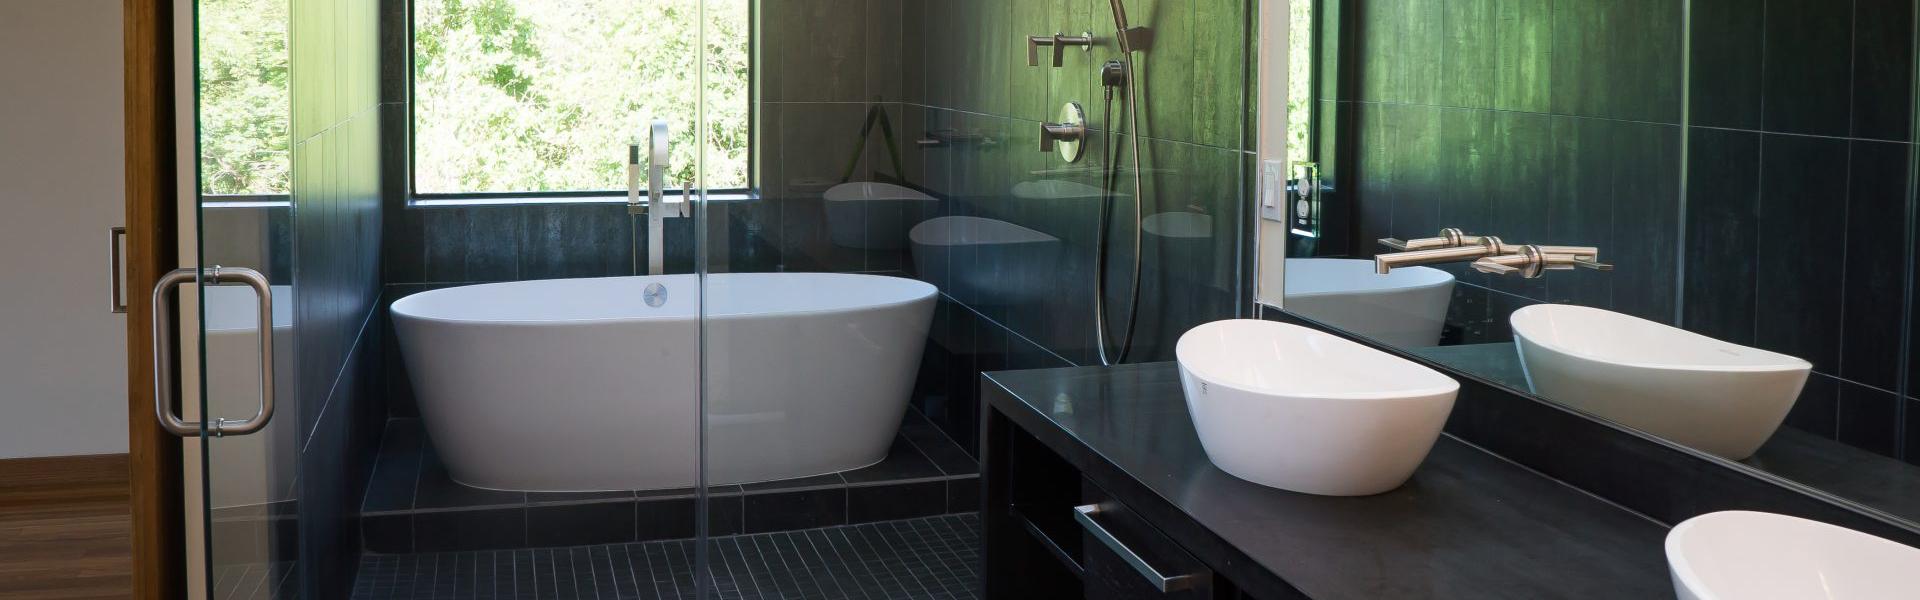 bathtub plumbing boulder co